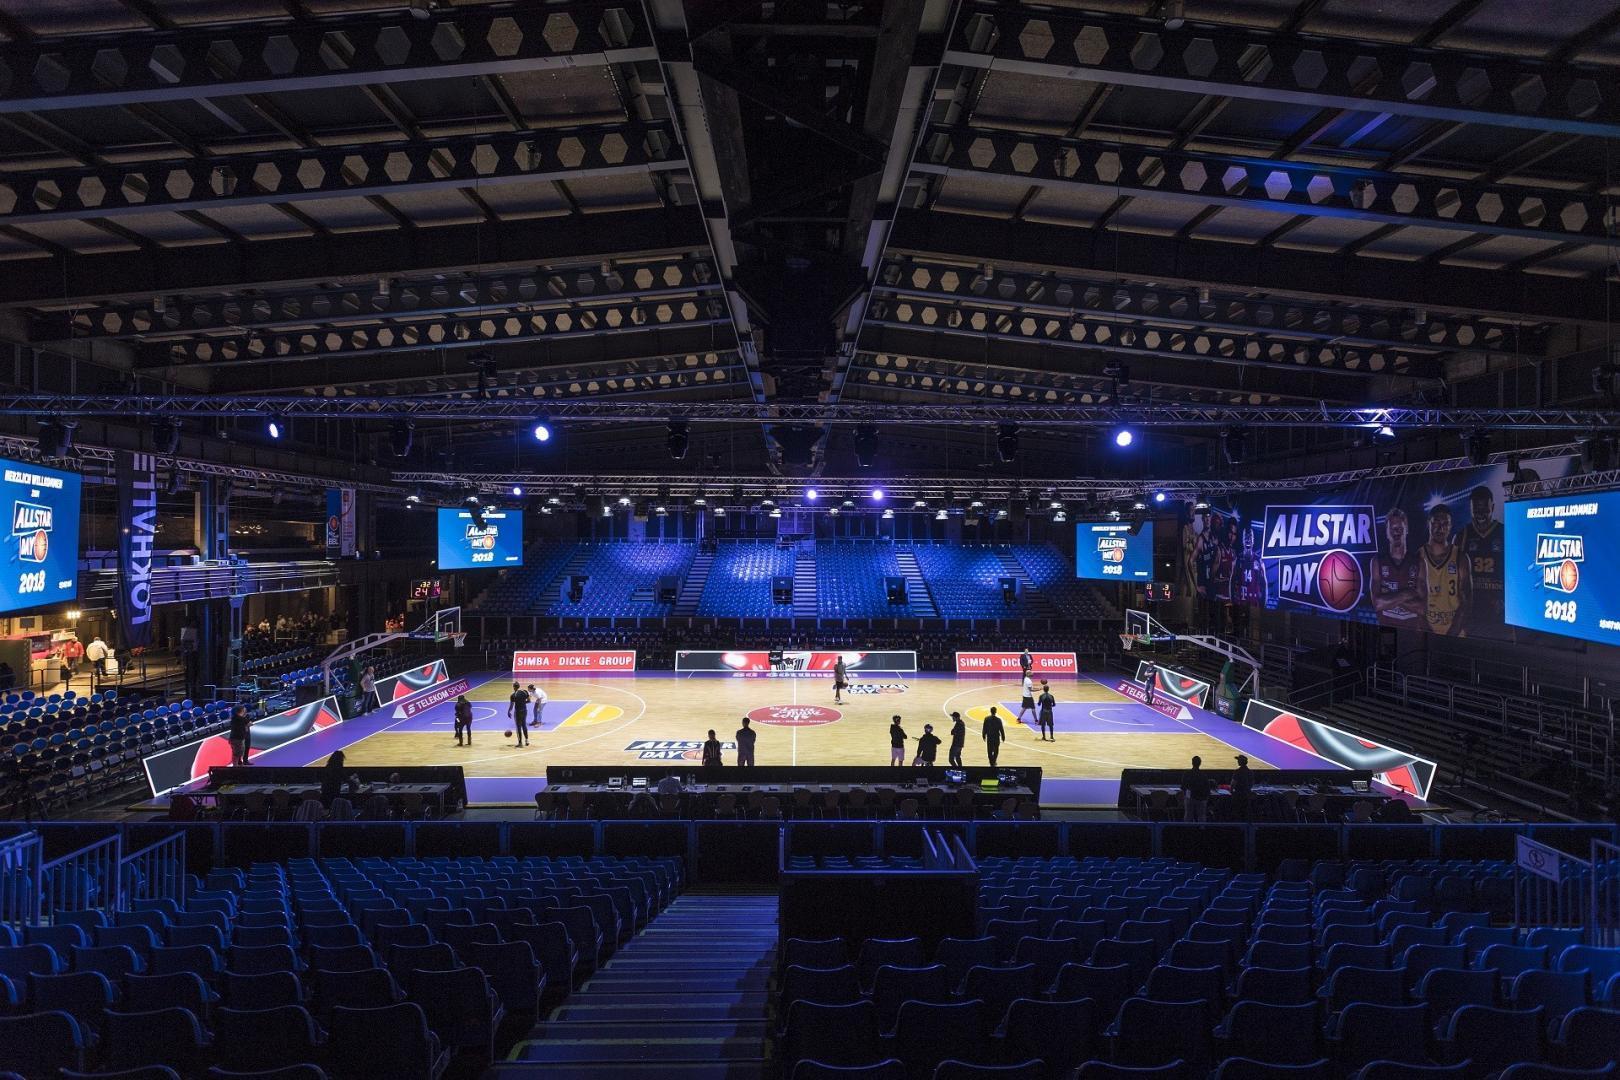 All Stars Day 2018 Lokhalle